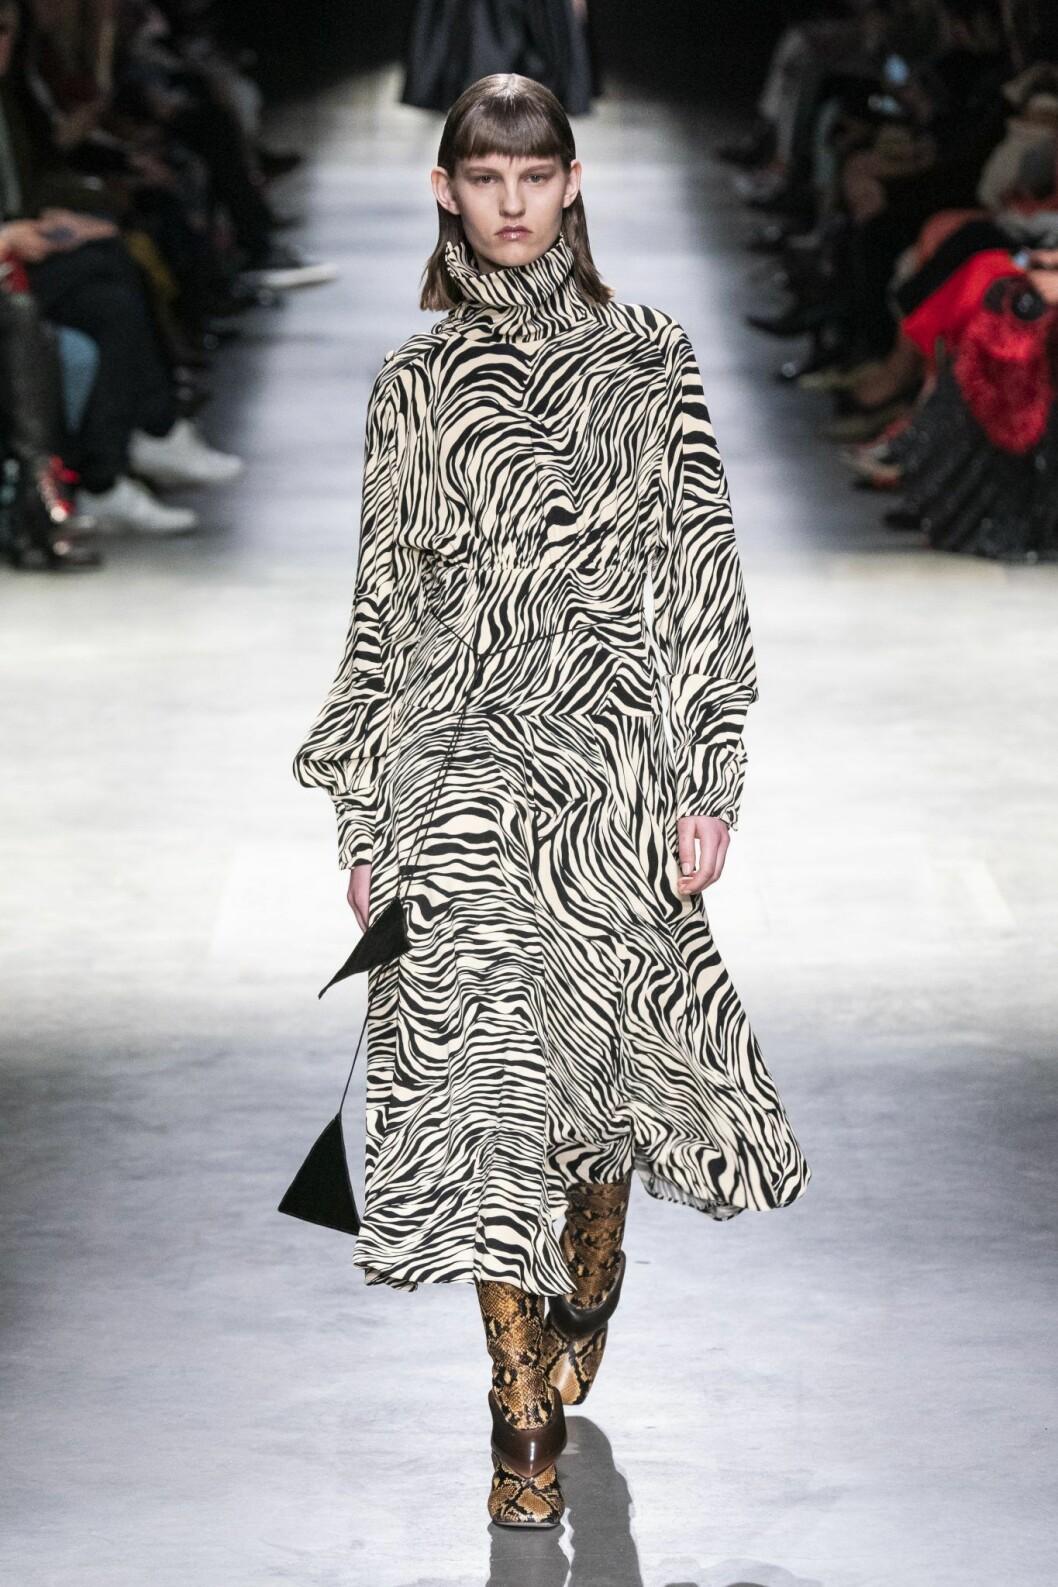 Zebraprint klänning